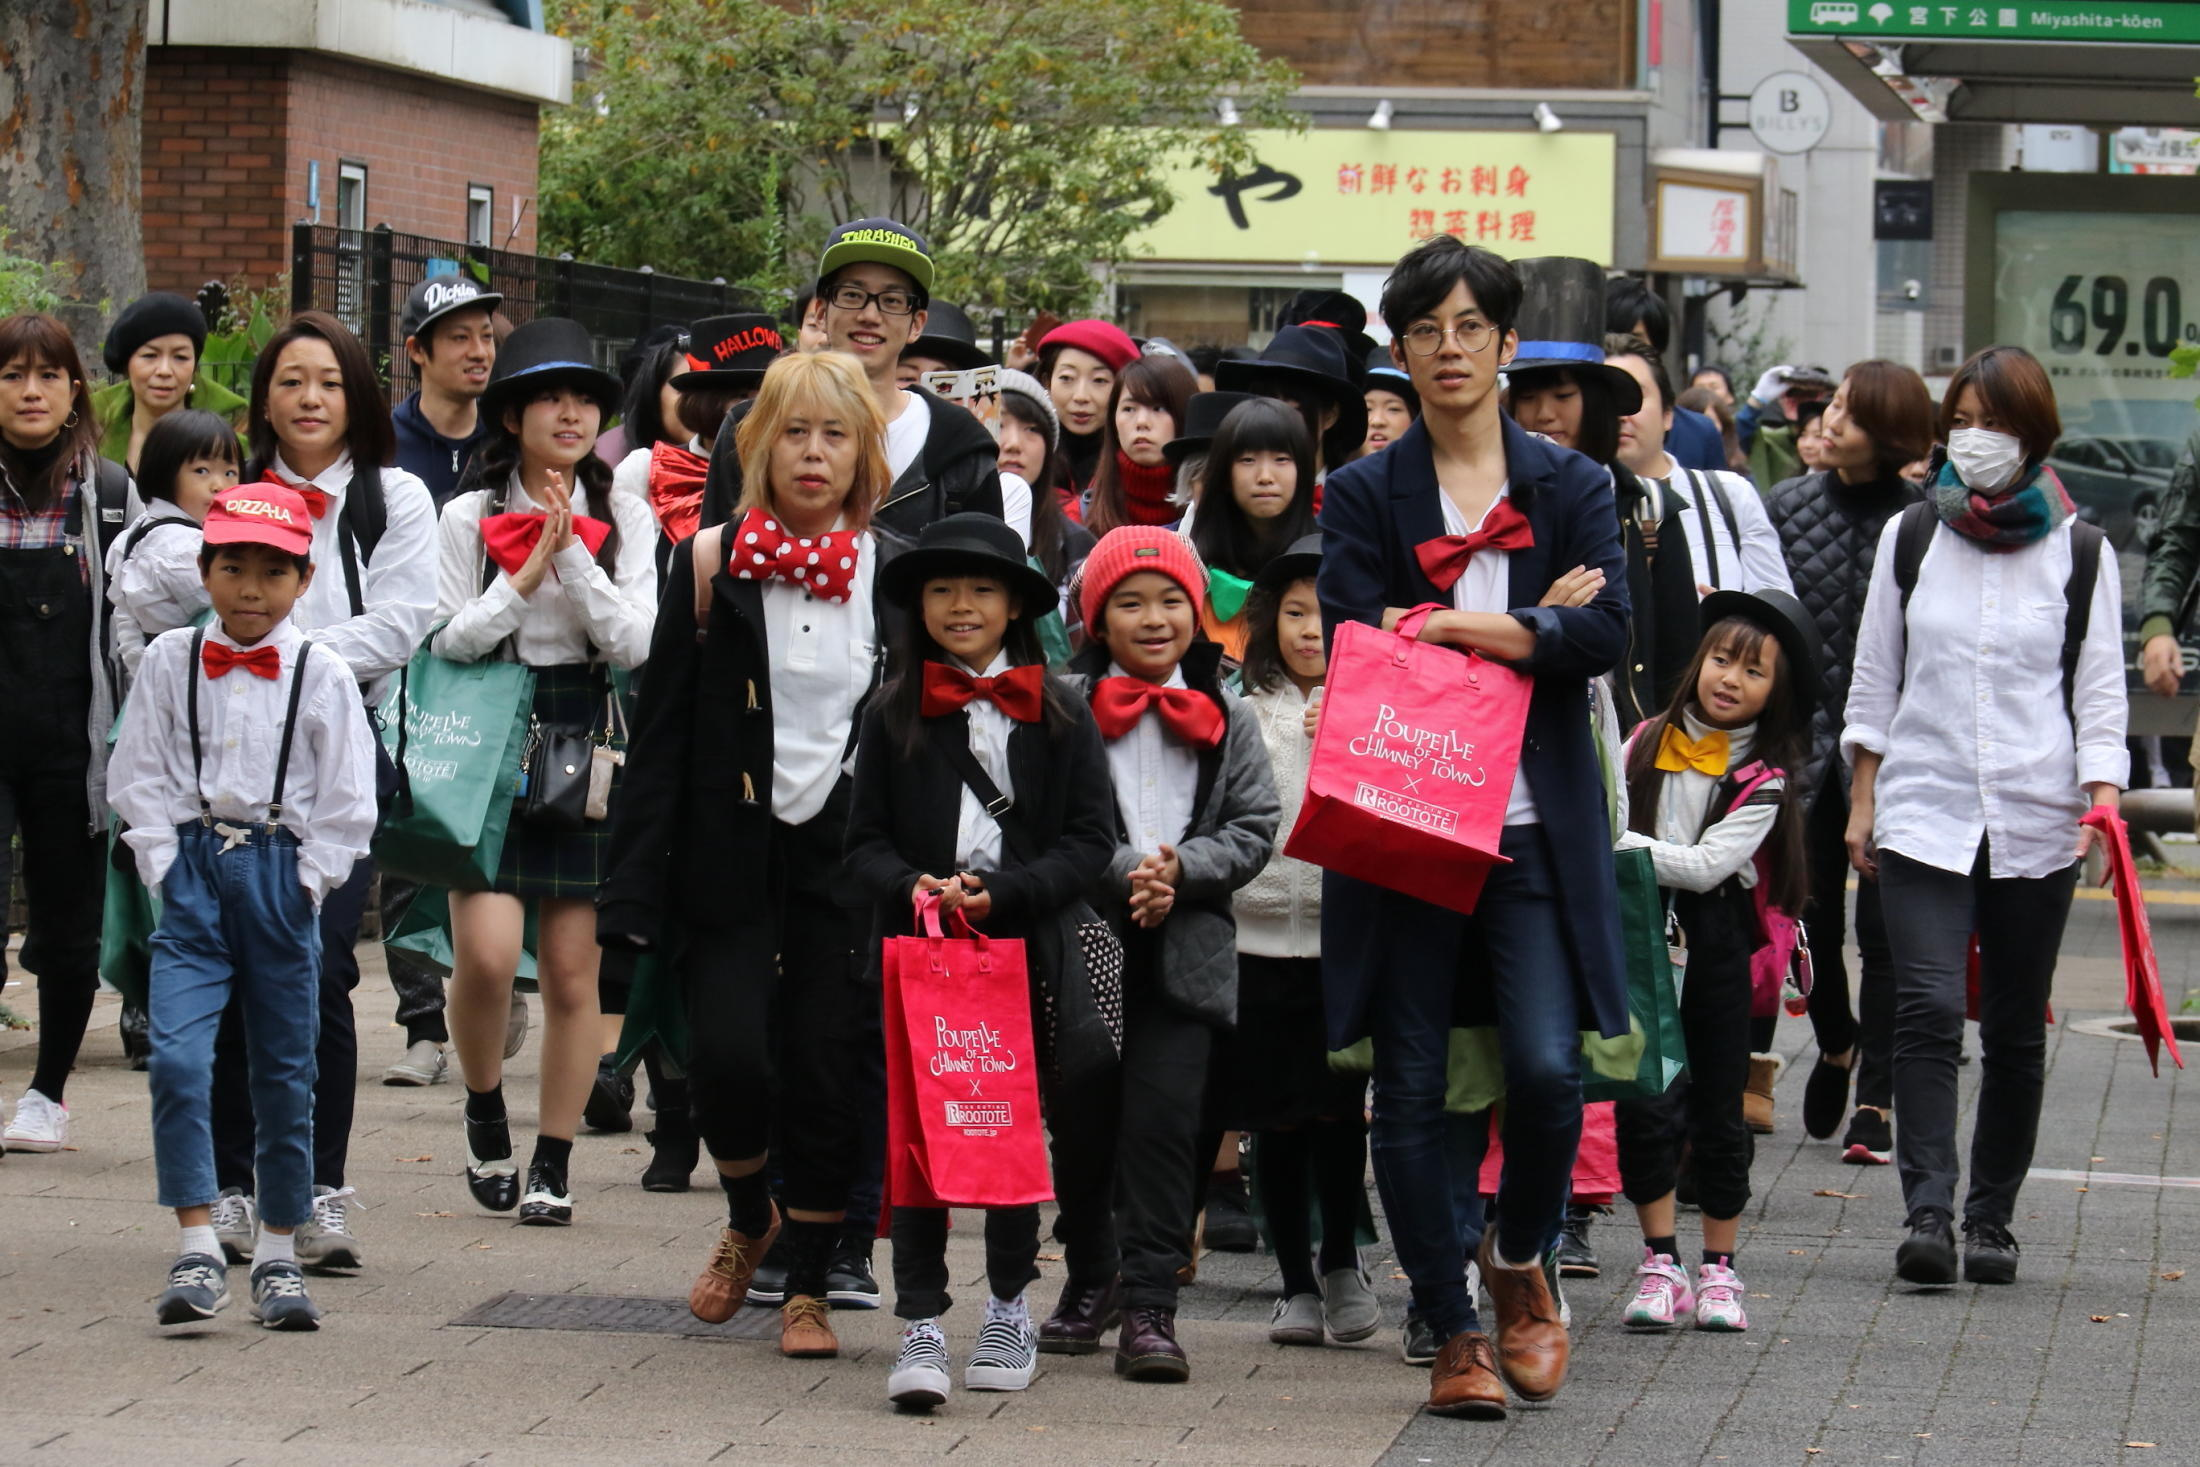 http://news.yoshimoto.co.jp/20161031085716-ddbe649e316c7275f063dce1a2ca13adfbdd38d5.jpg